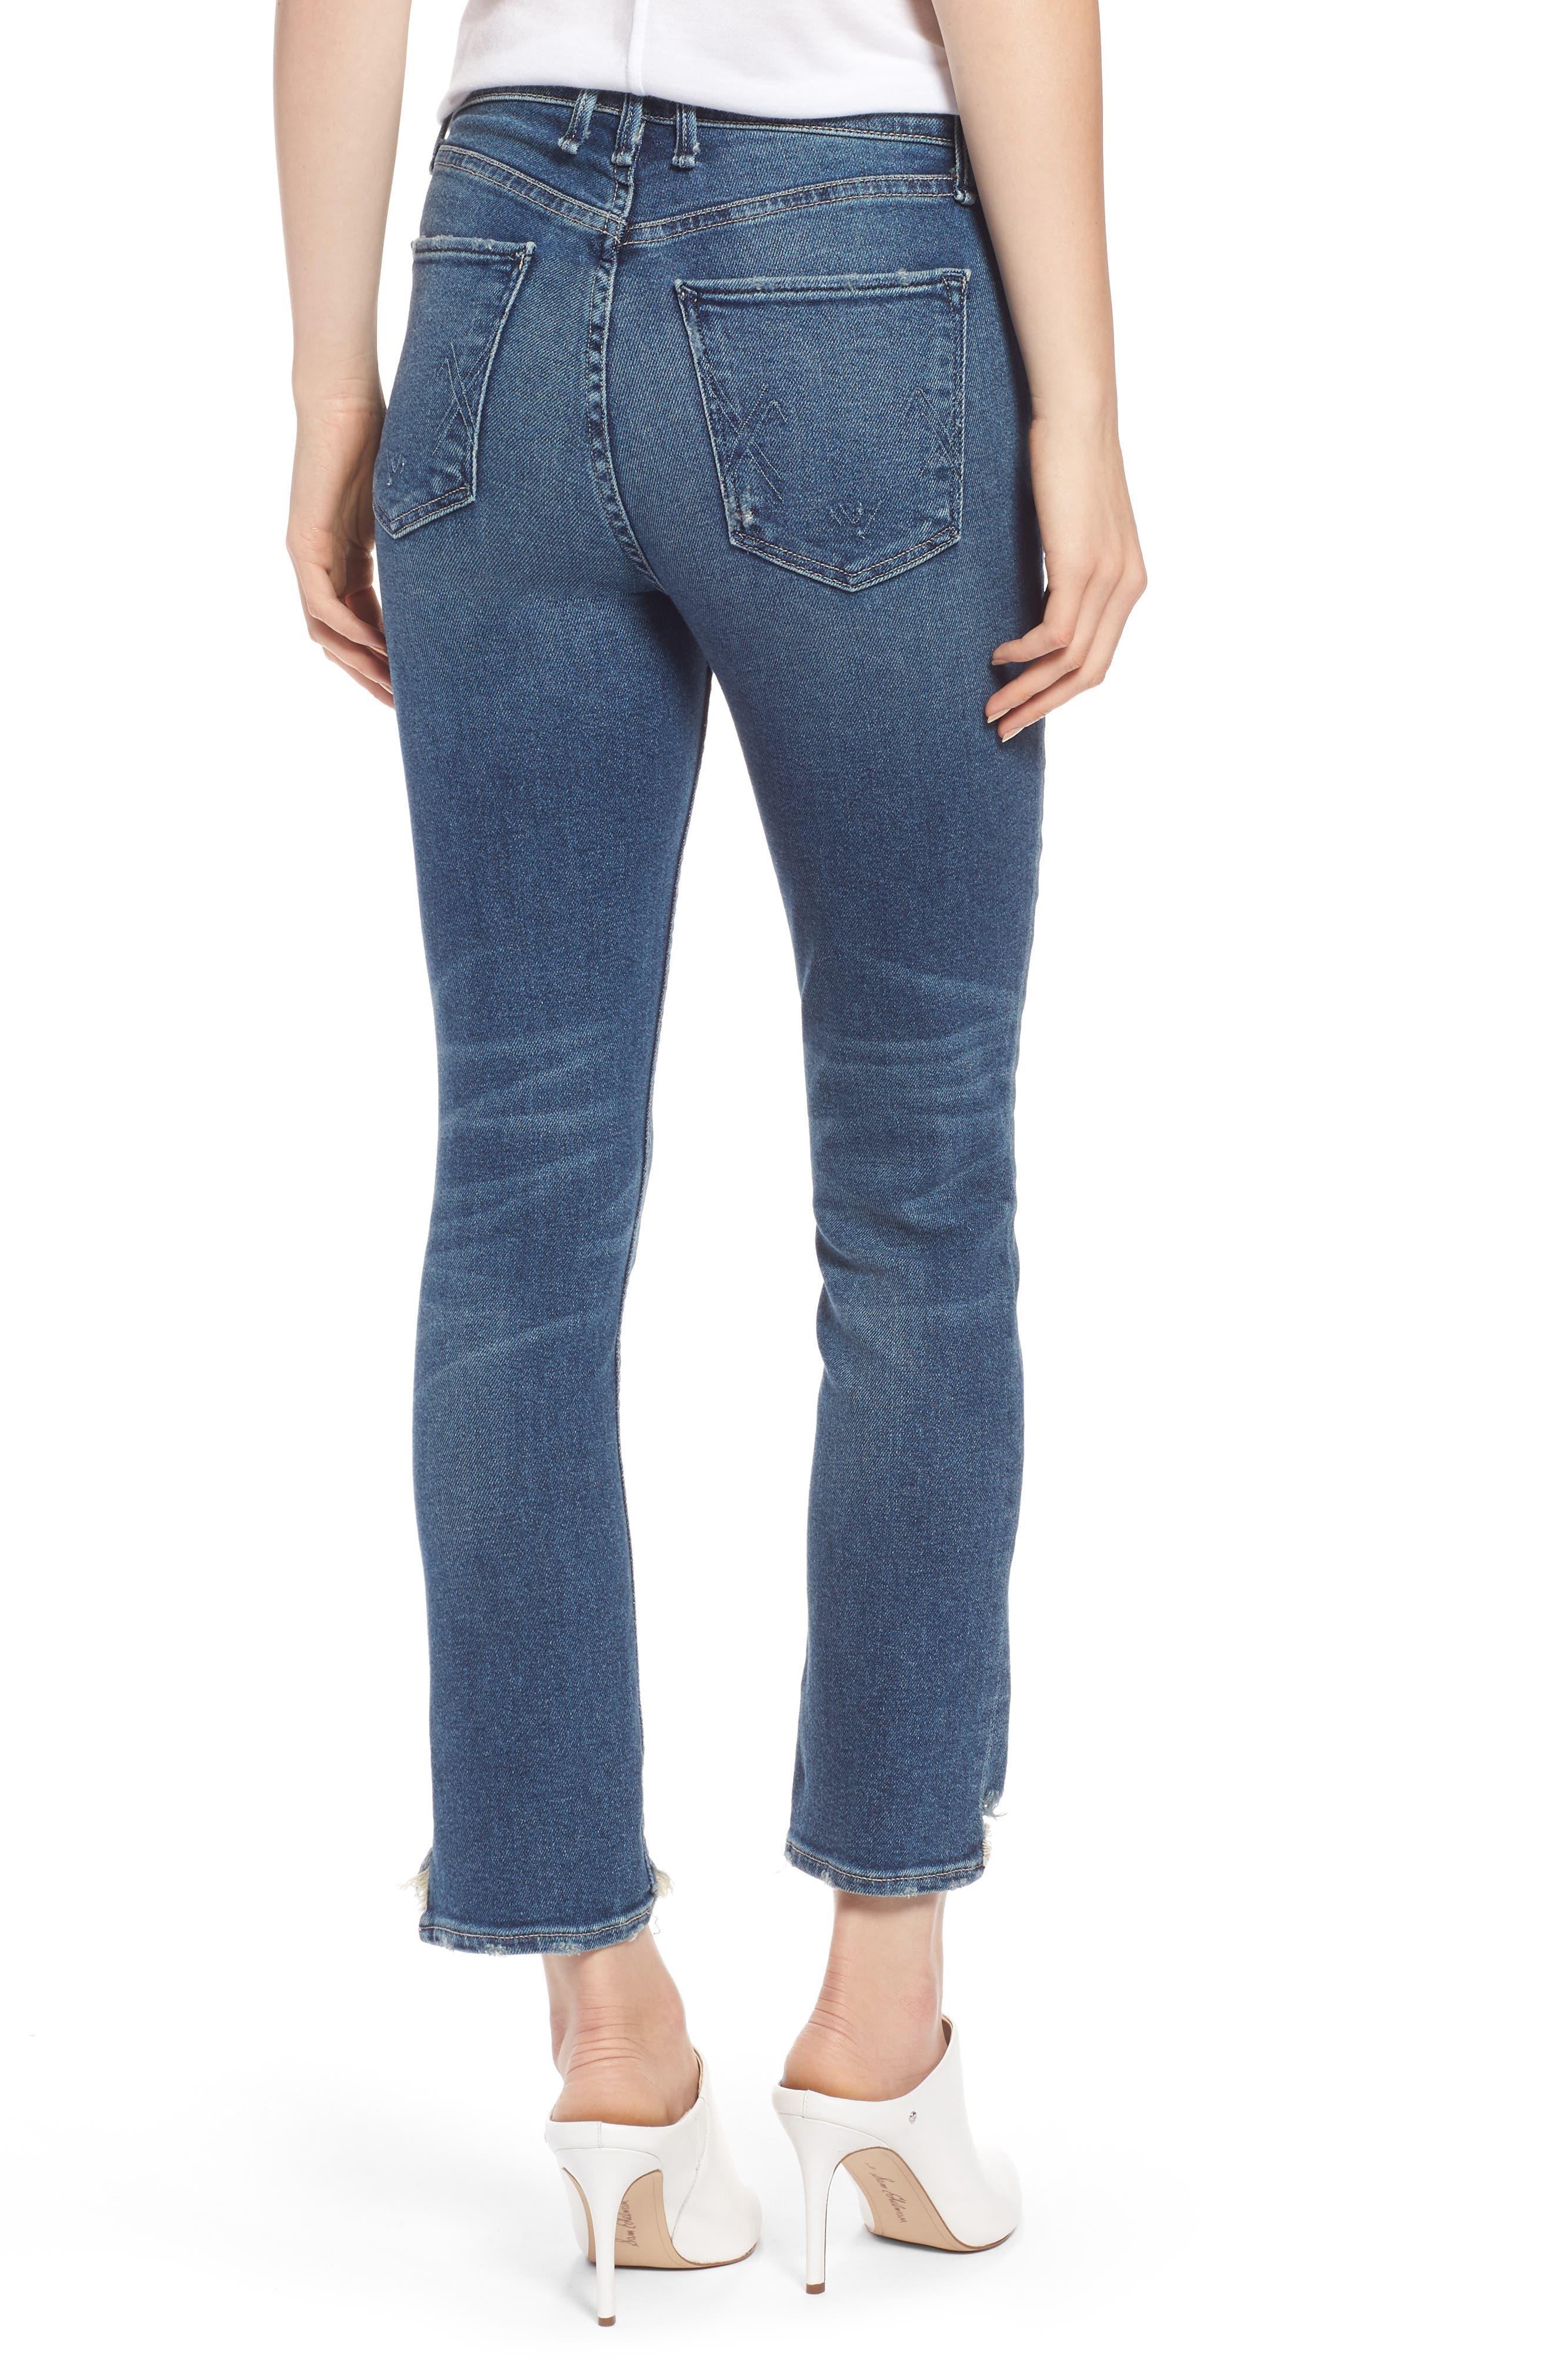 Valetta High Waist Crop Straight Leg Jeans,                             Alternate thumbnail 2, color,                             Way Up North